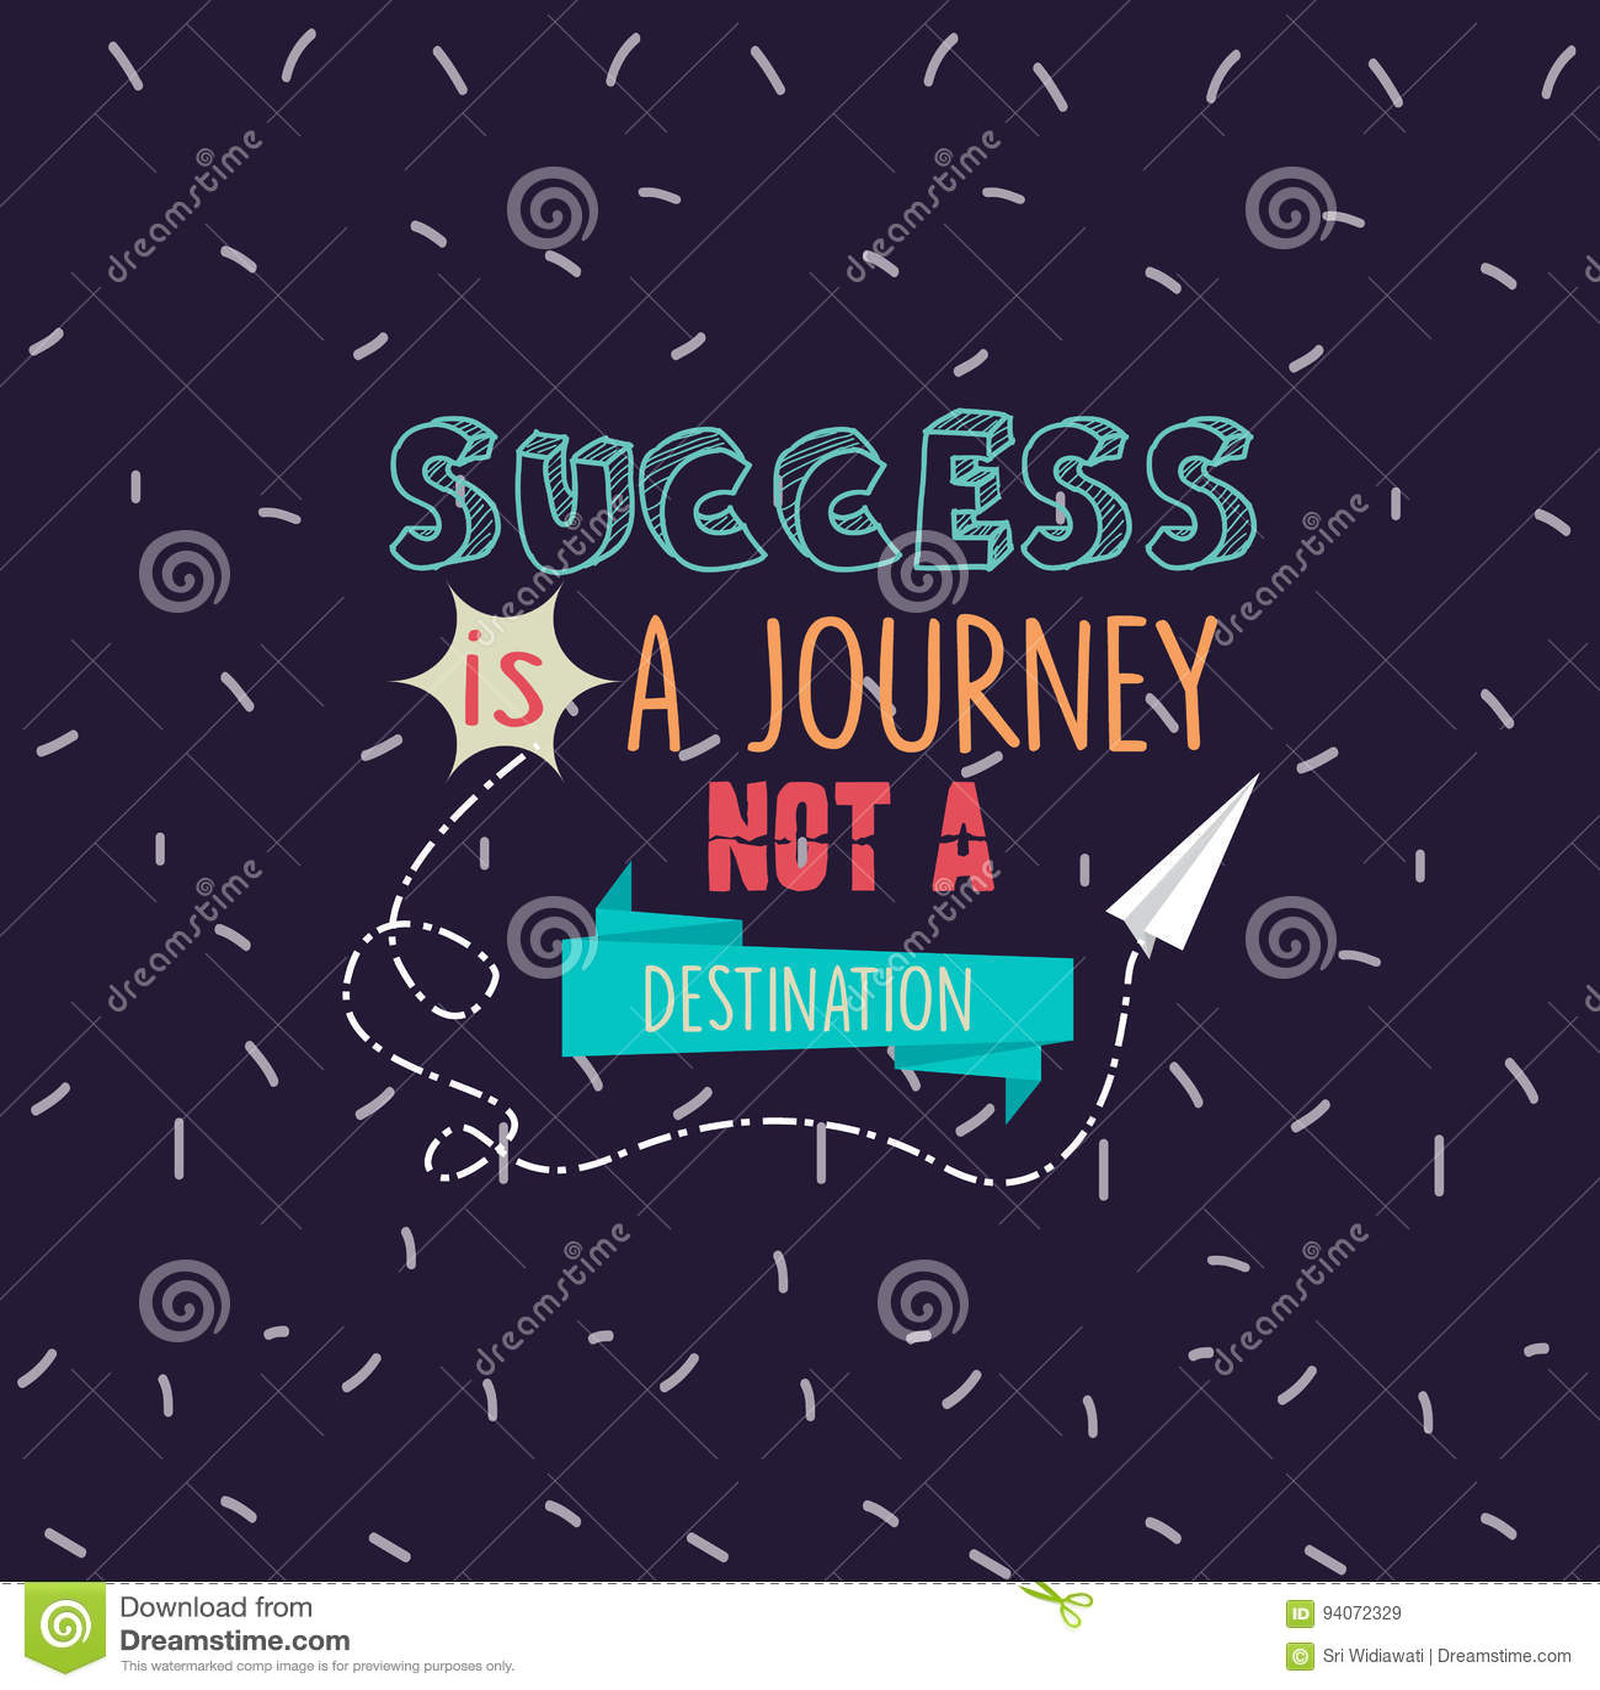 Success Is A Journey Not A Destination Quotes Motivation Stock